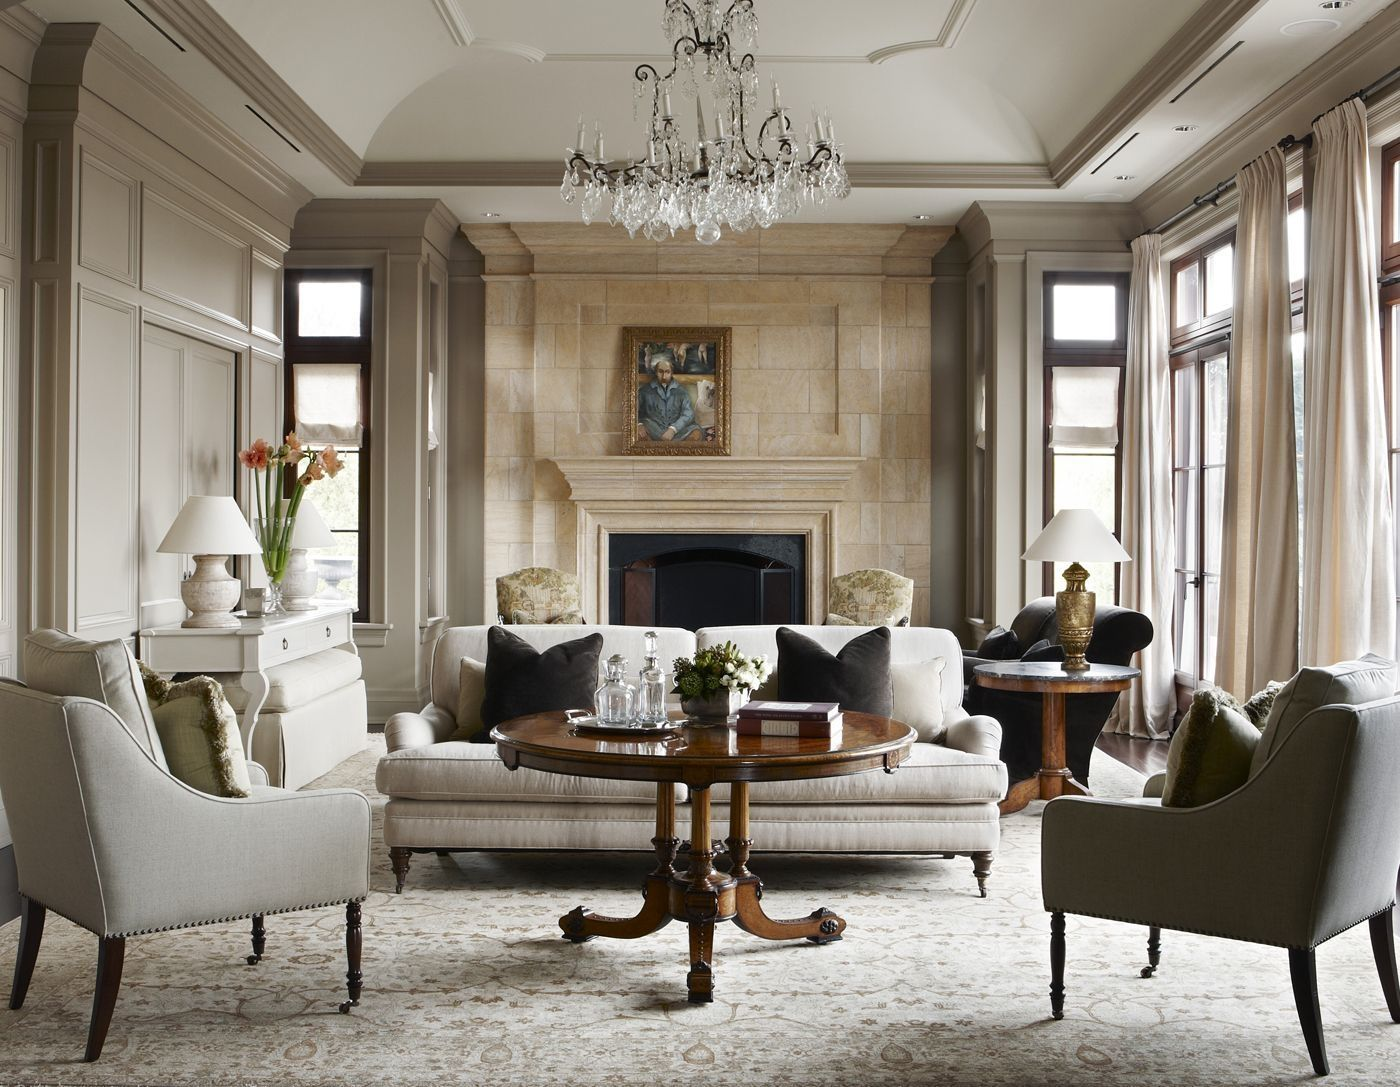 48 unbelievable ideas classic home decoration classic on home interior design ideas id=39225